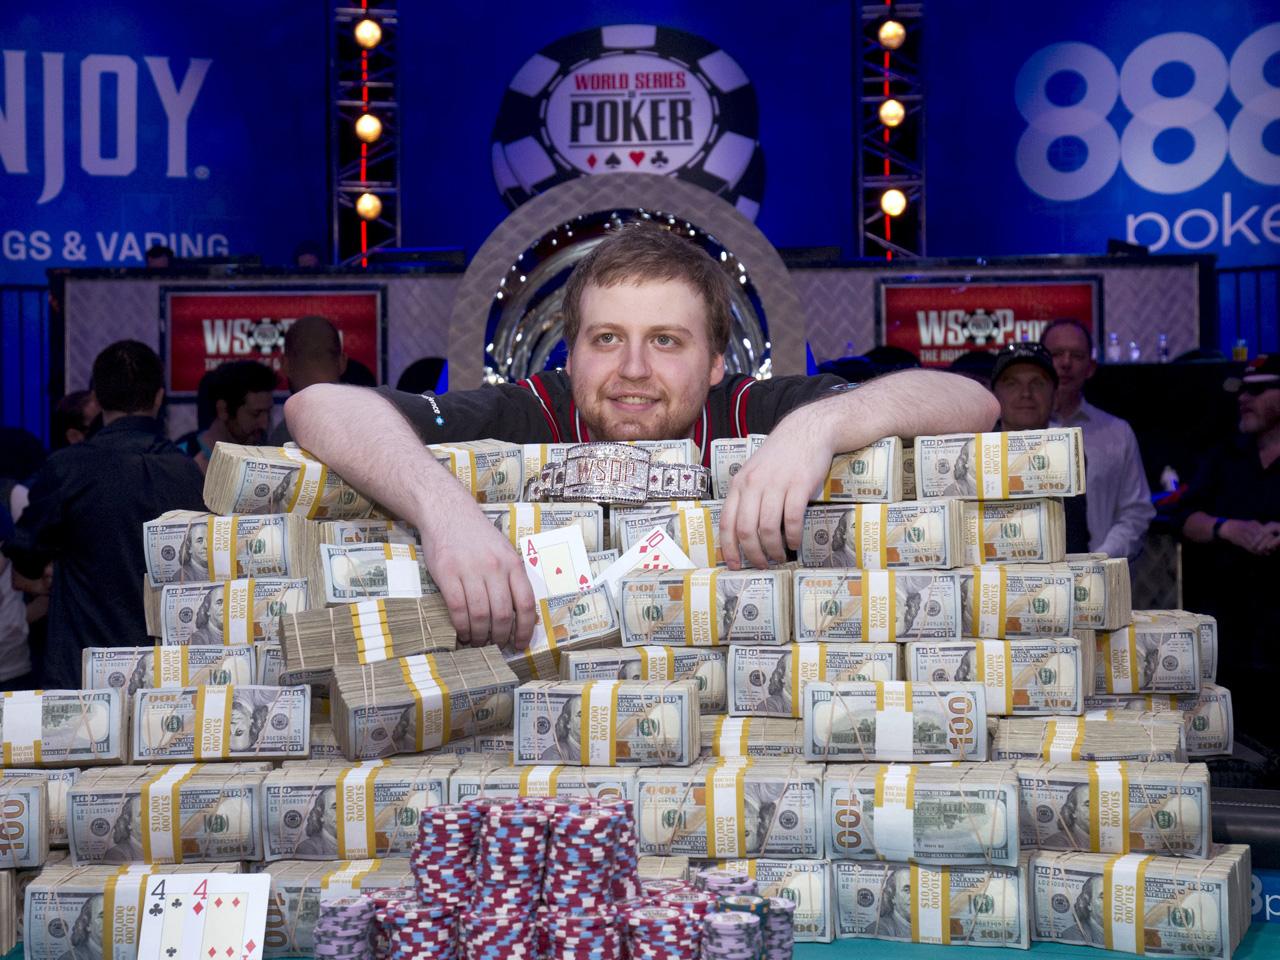 WSOP Poker online Sunset -762537